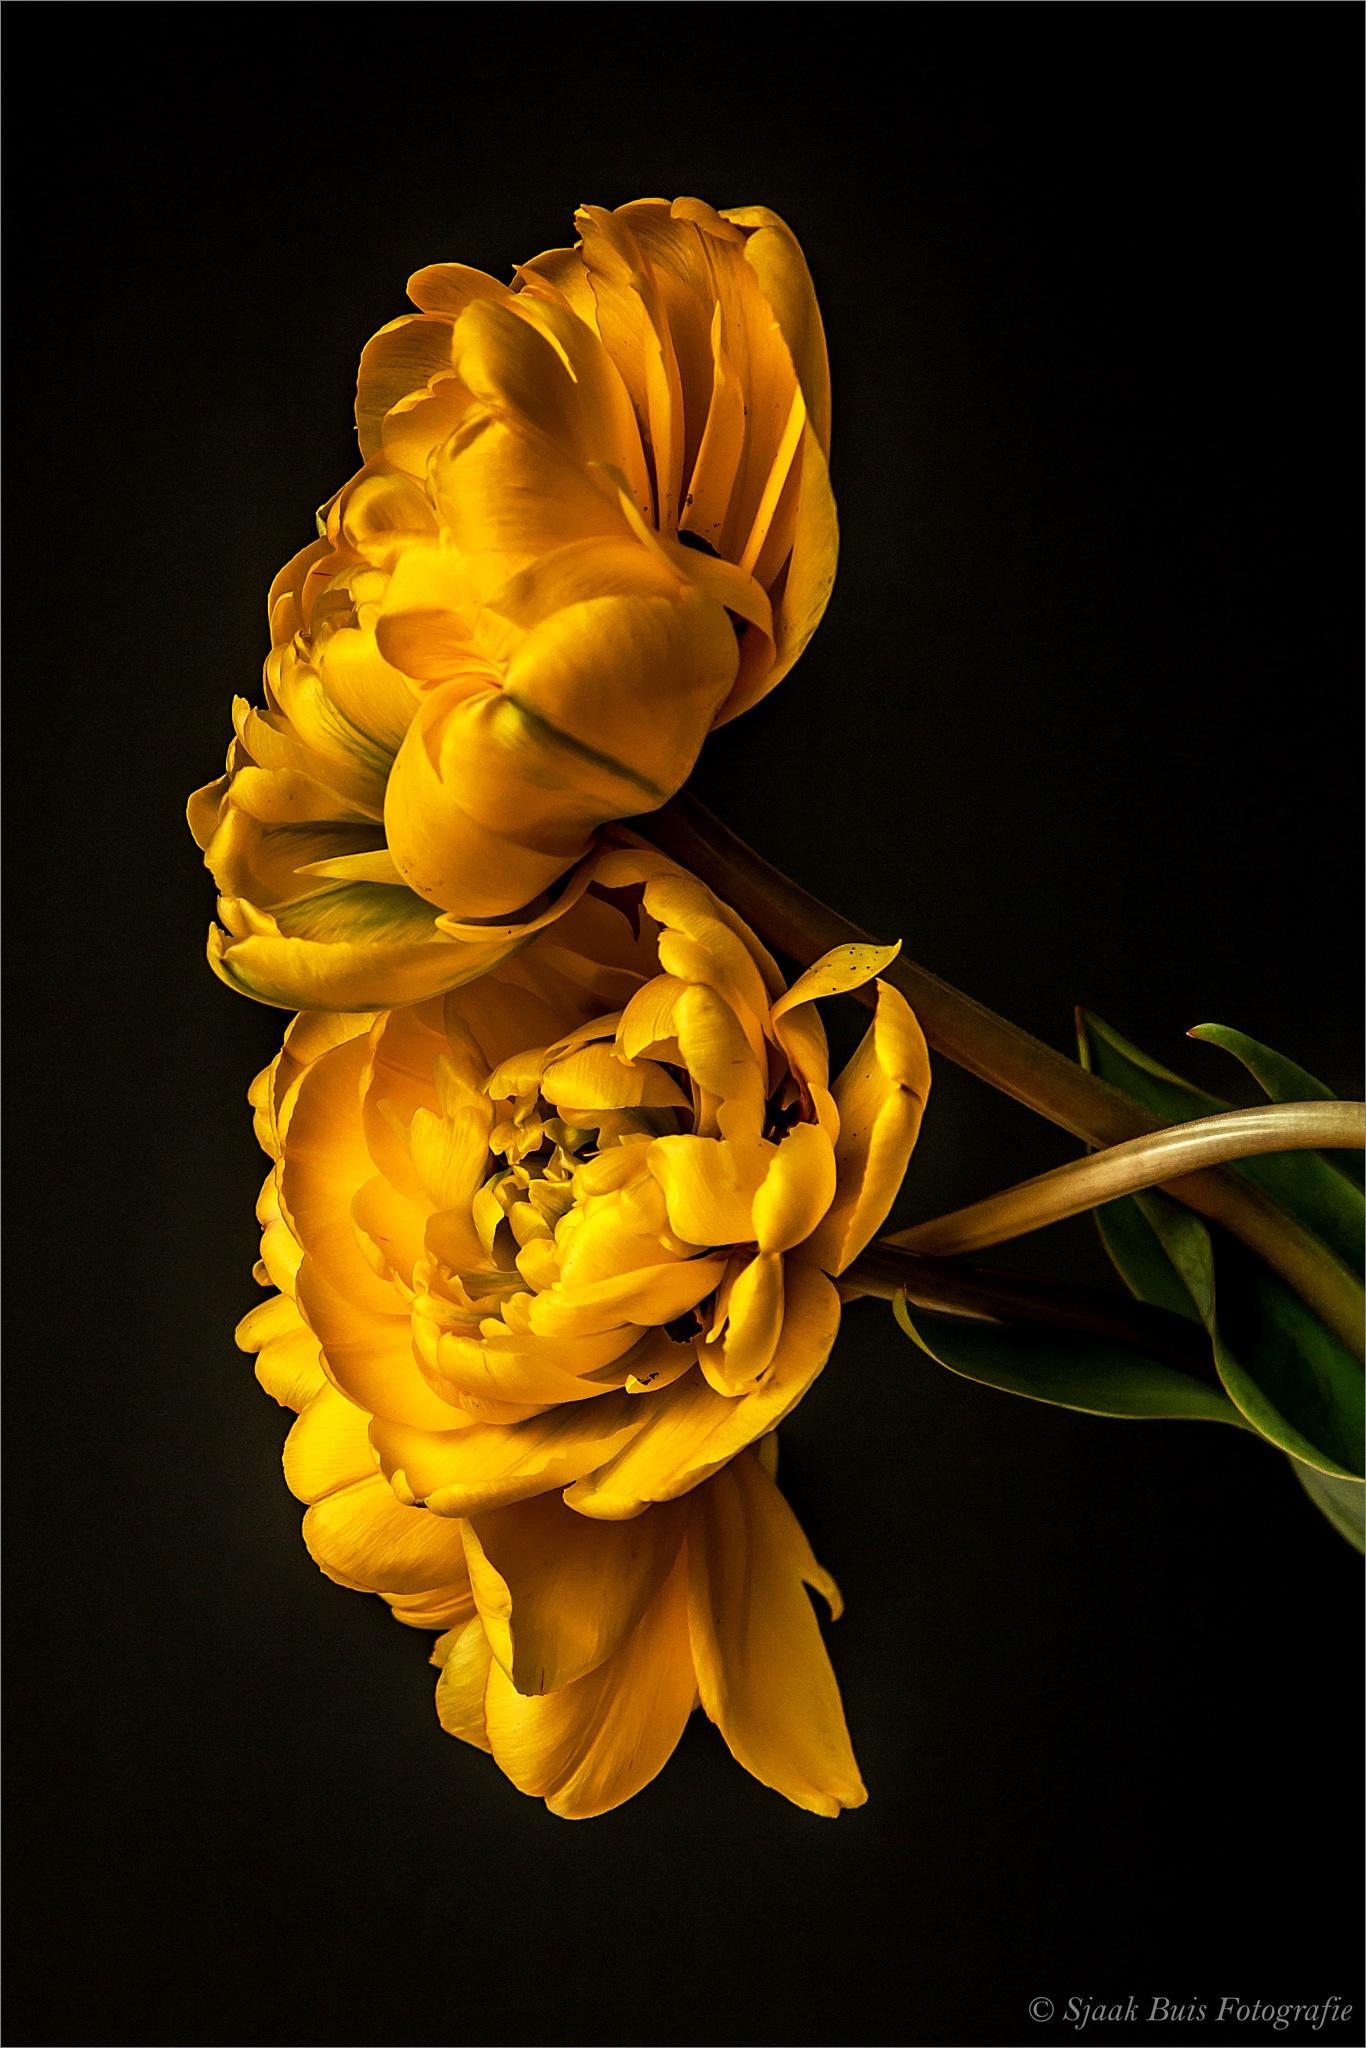 Yellow Peony tulip 4 by Sjaak Buis